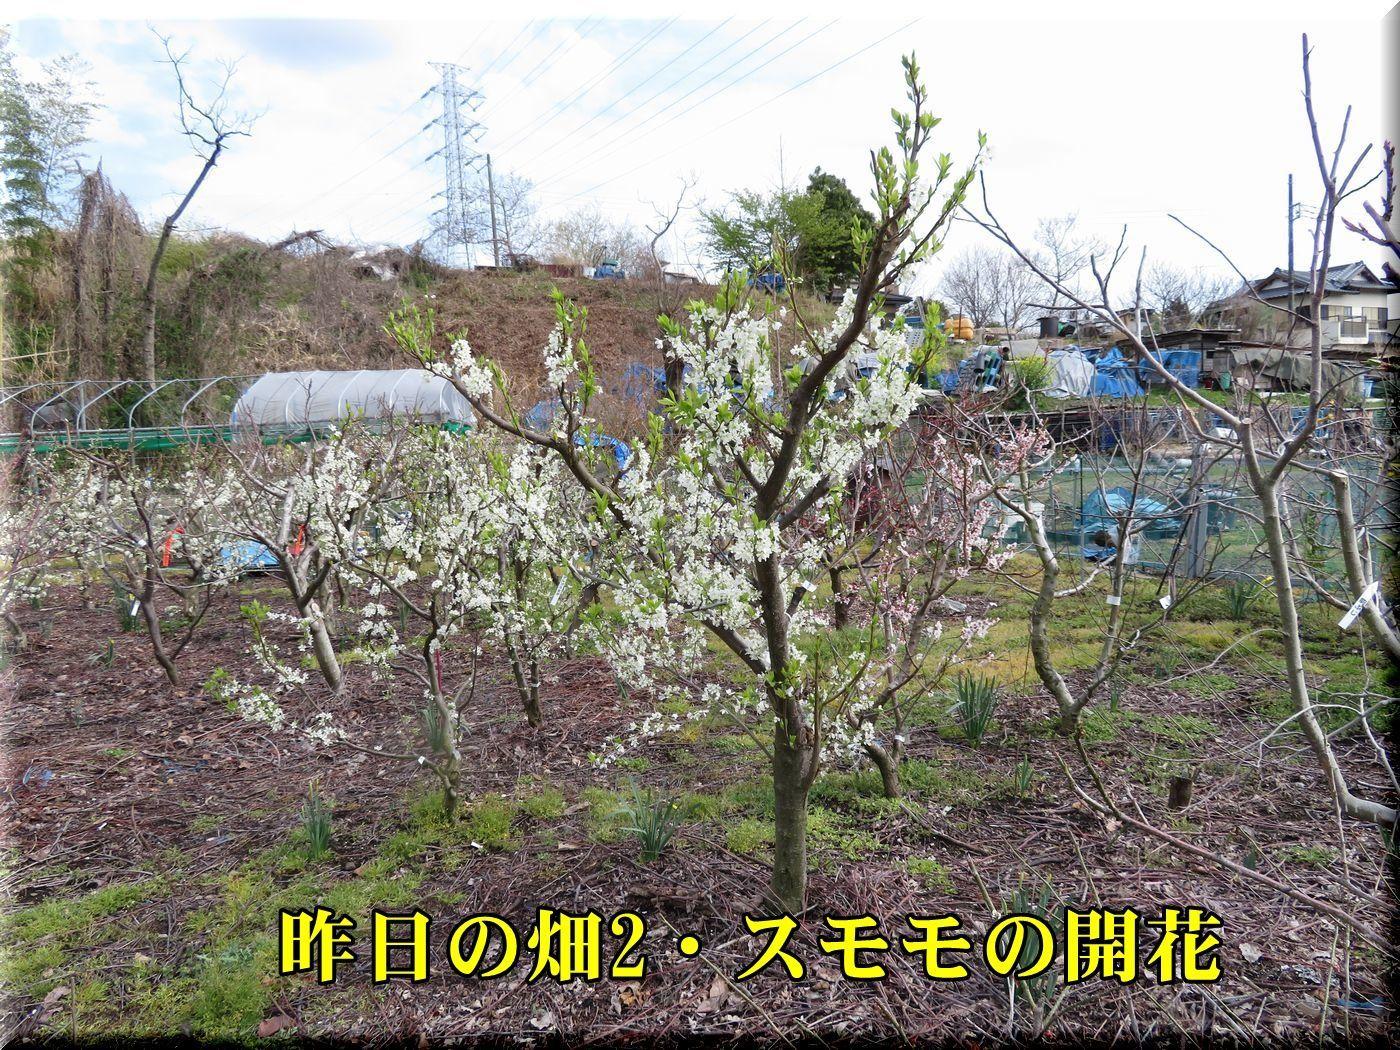 1sumomo180324_011.jpg